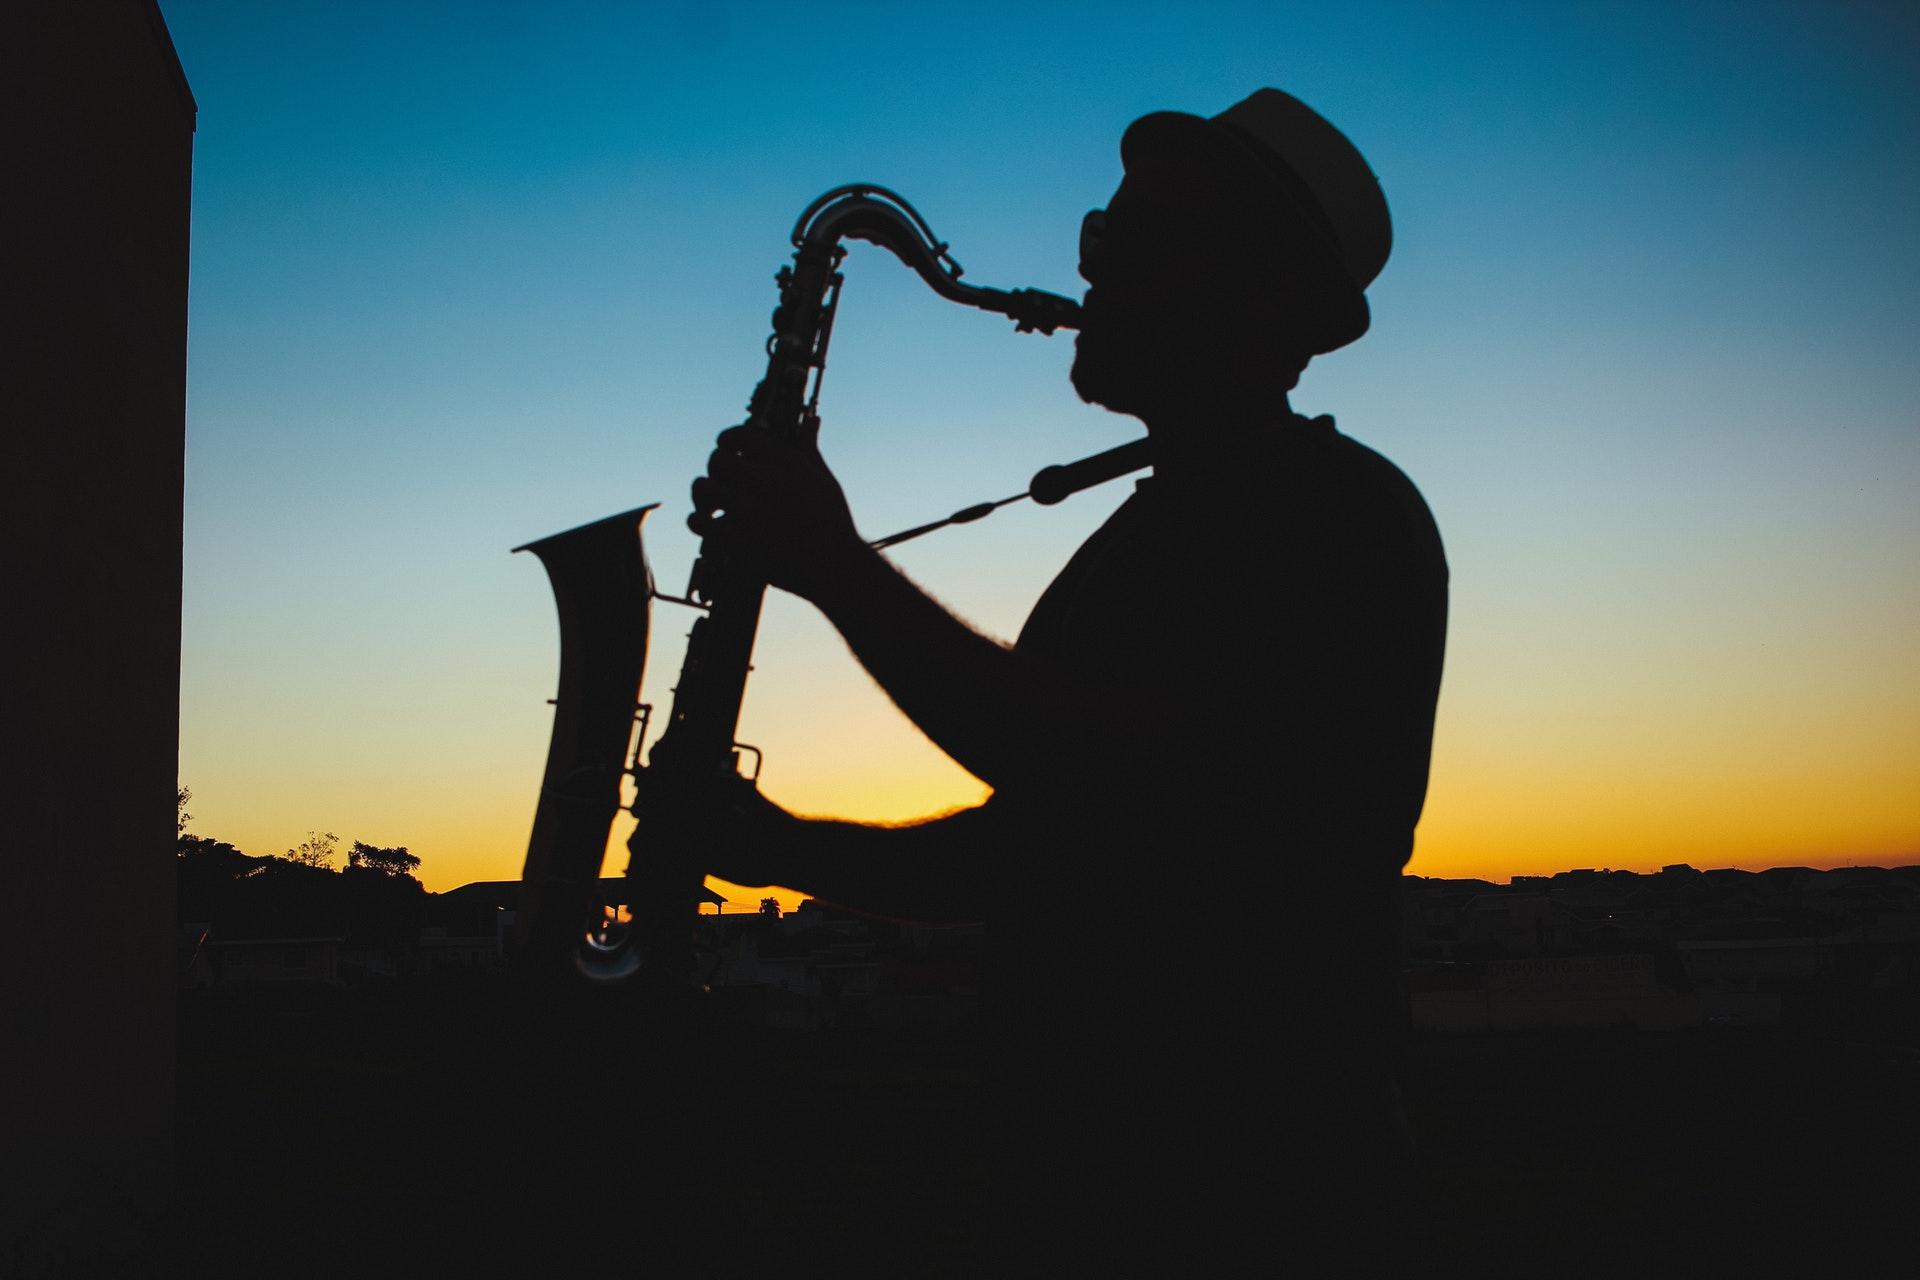 SpotifyでPOP LIFE~ジャズの会のタナソーと柳楽光隆とロバート・グラスパー。そして自分の関心軸で想うこと。